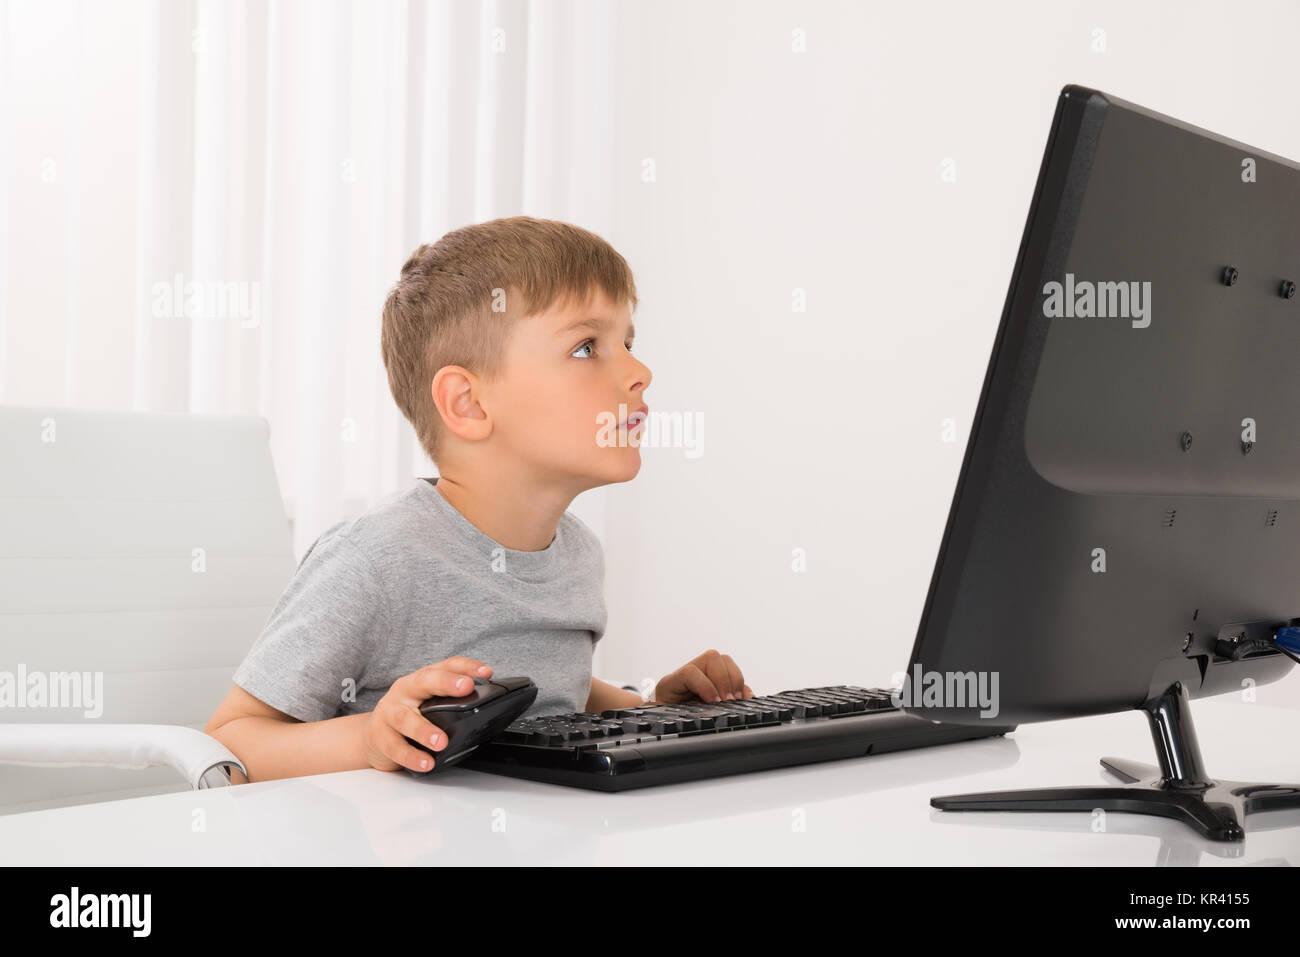 Boy Using Computer - Stock Image